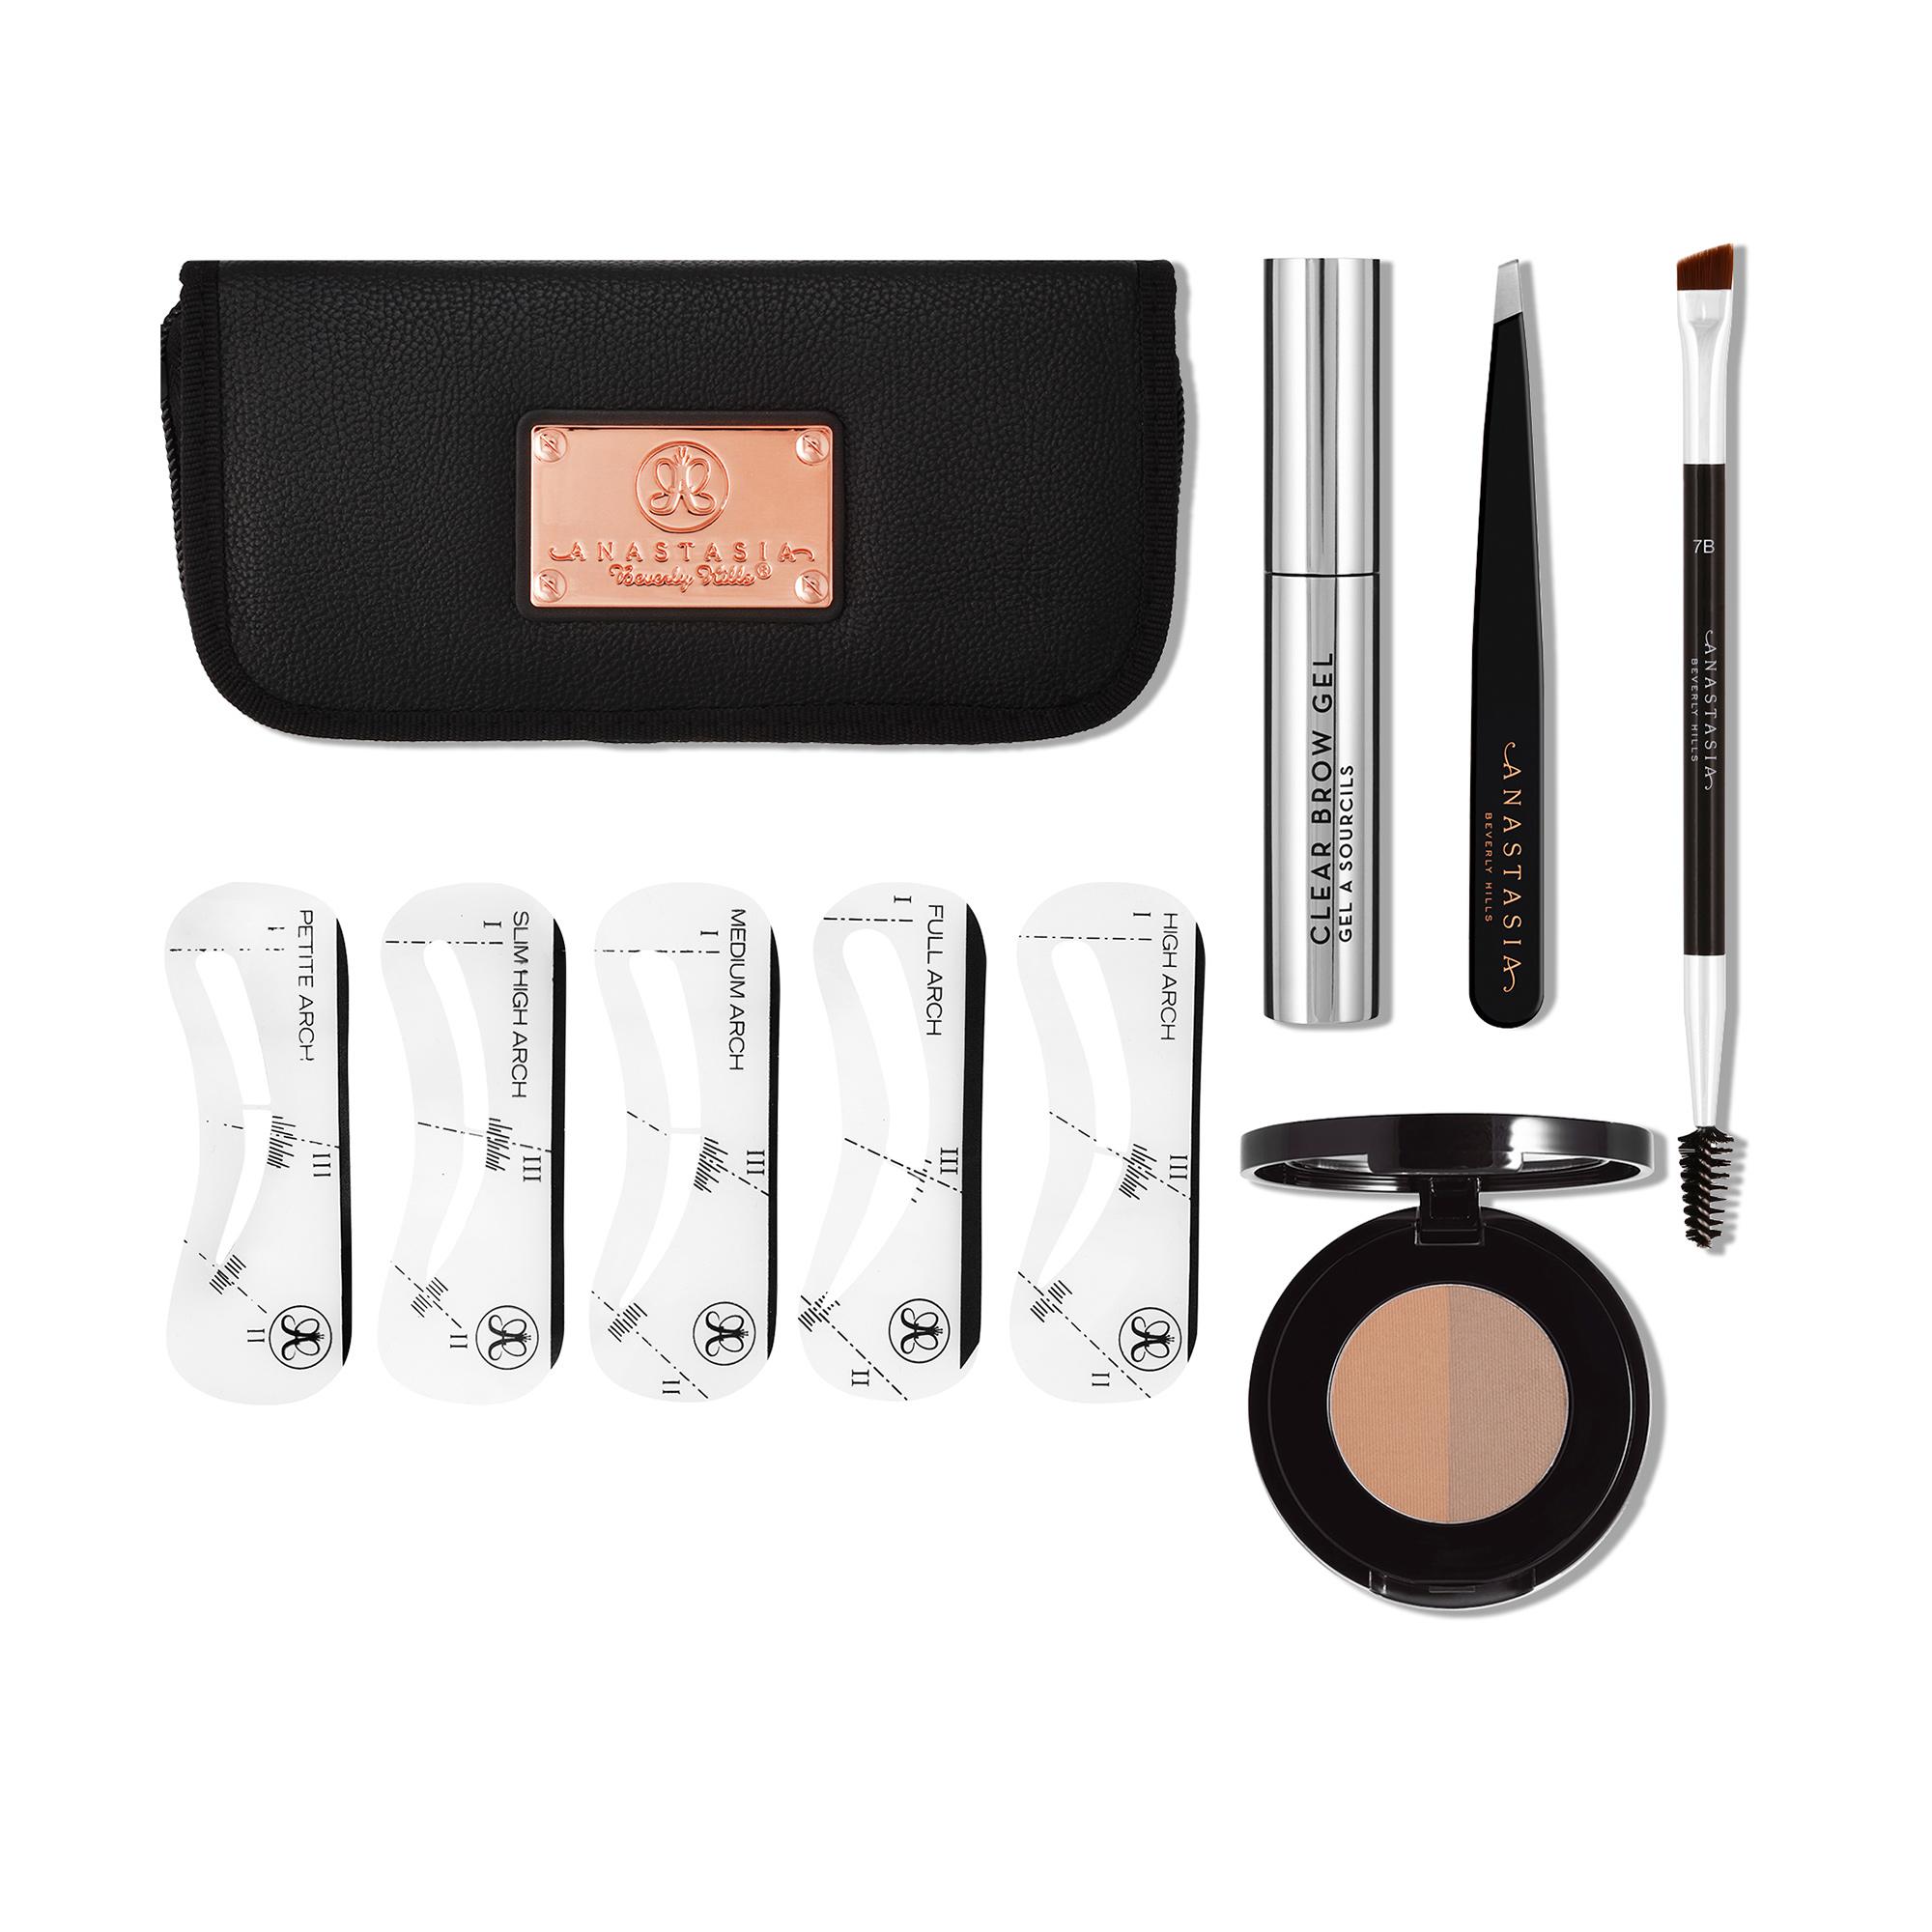 Anastasia Beverly Hills Brow Kit